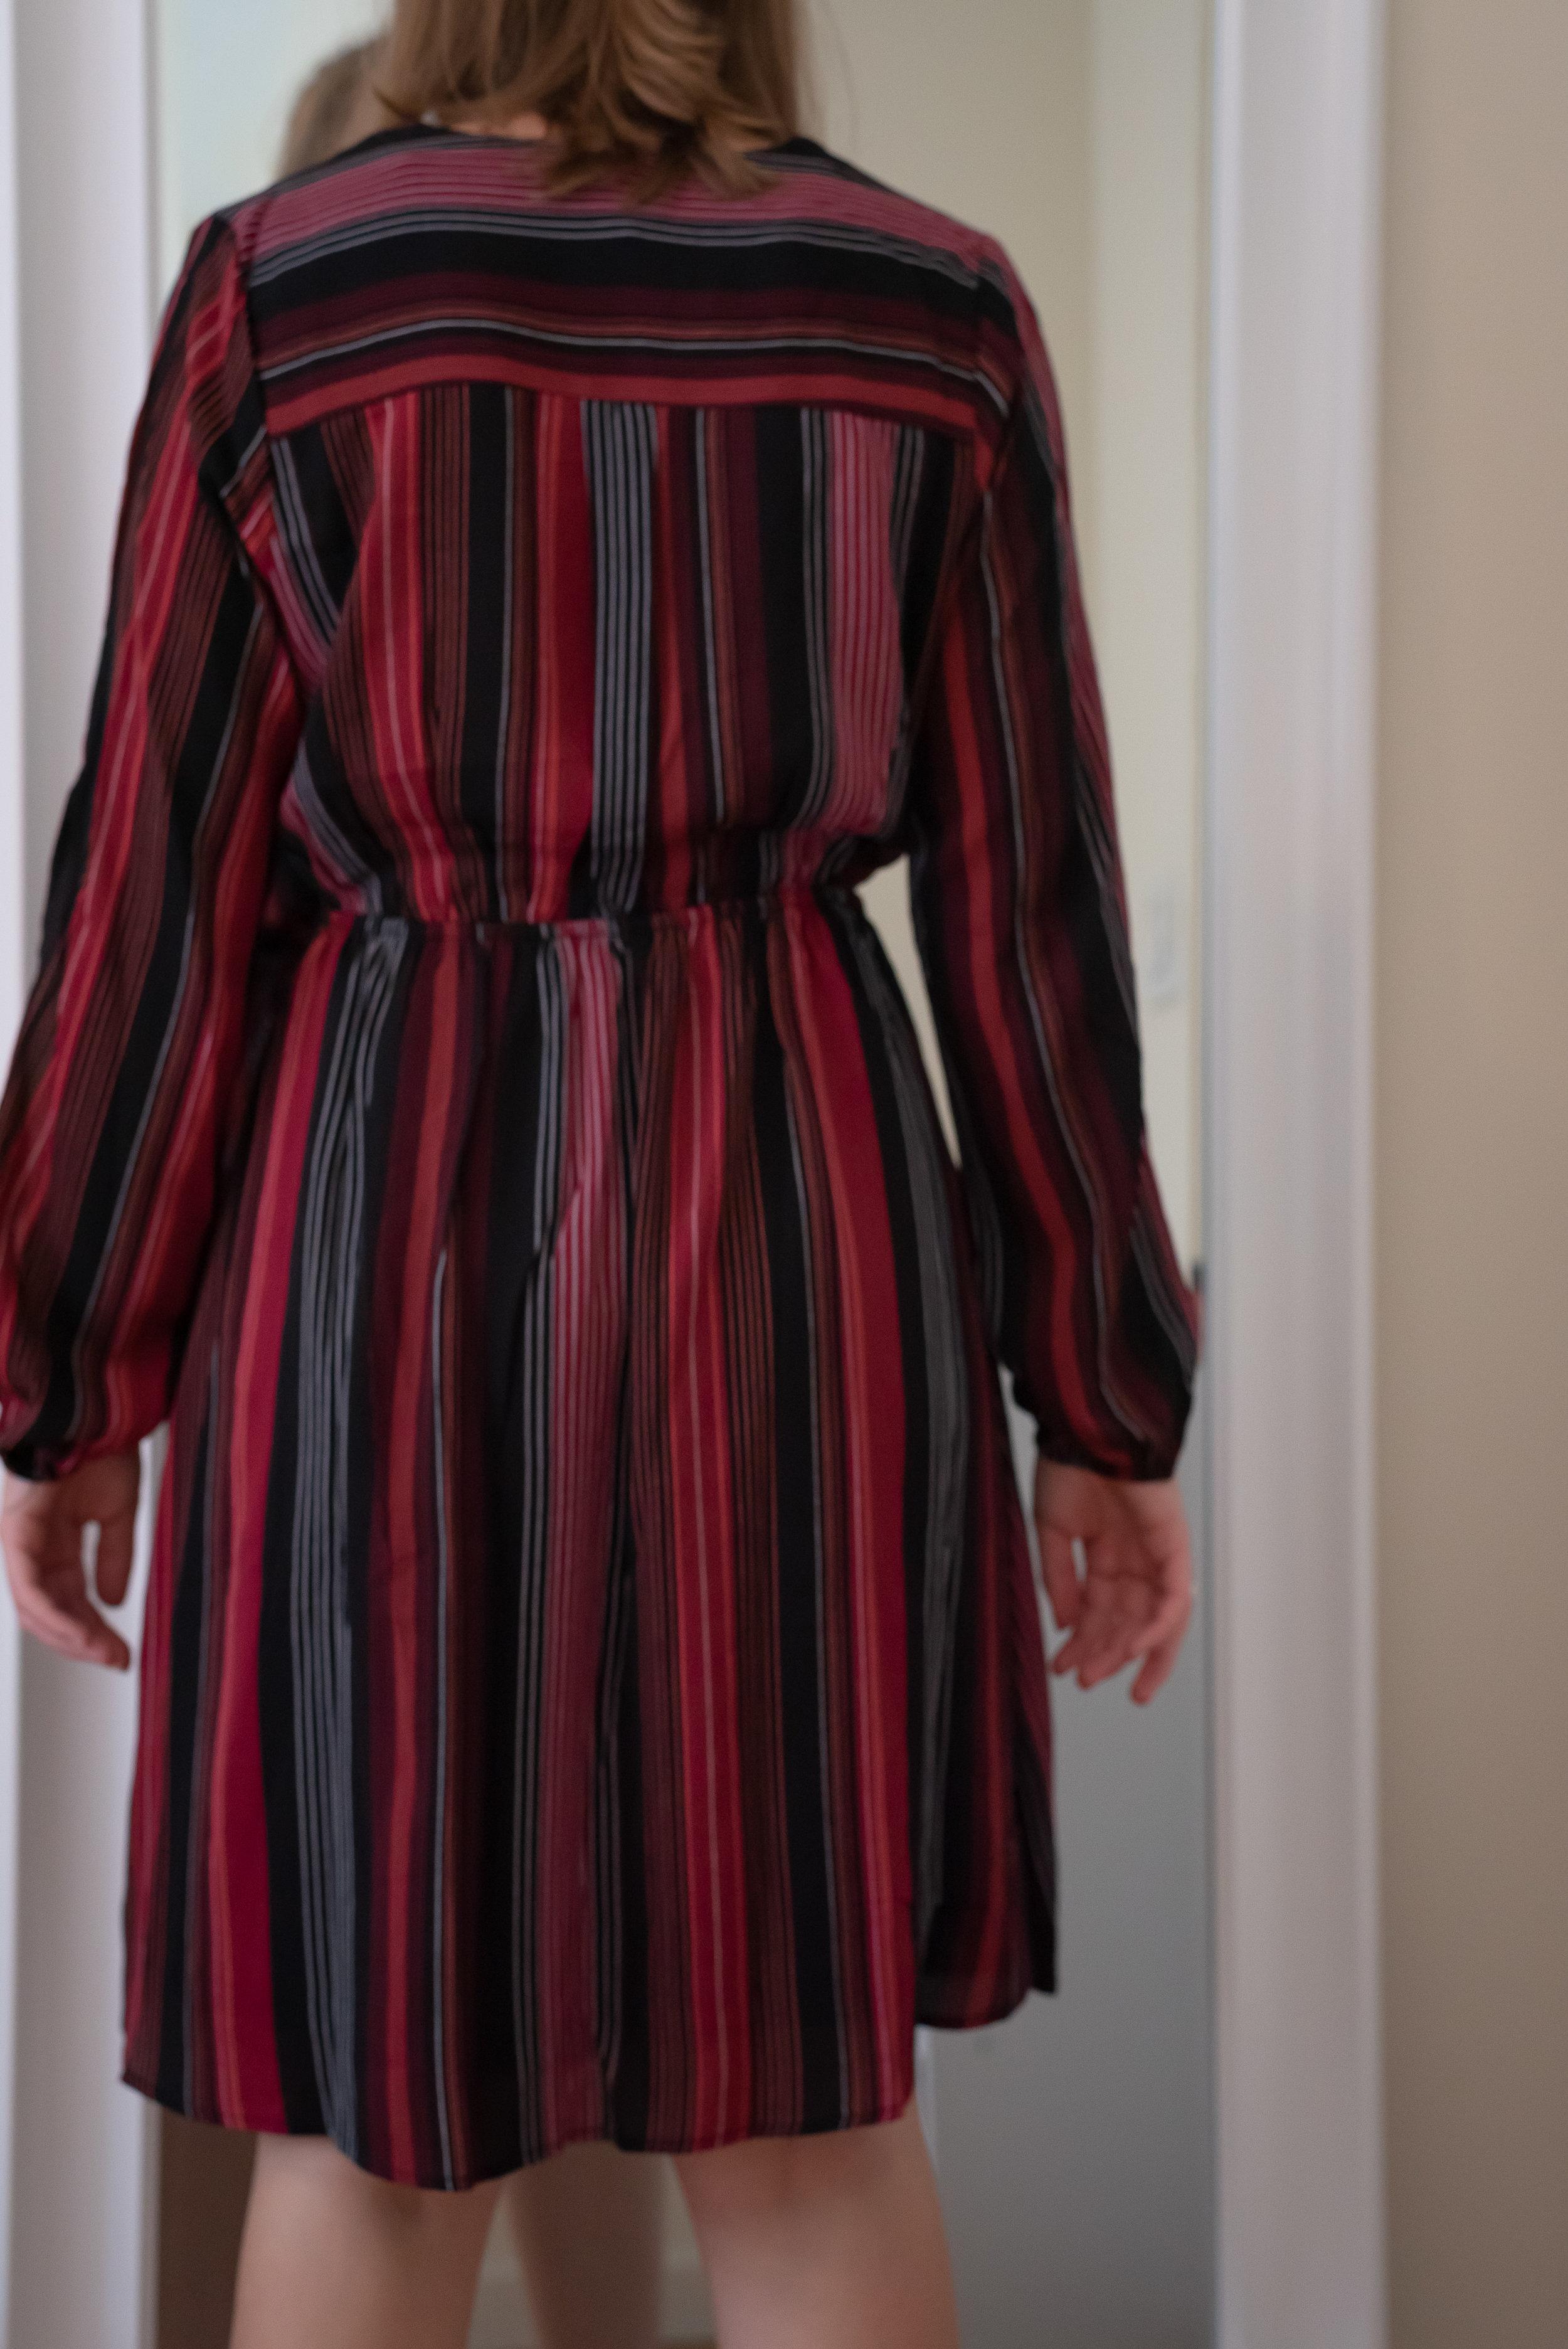 Monteau Petite Striped Split-Sleeve Faux-Wrap Dress - Size Petite S - BACK